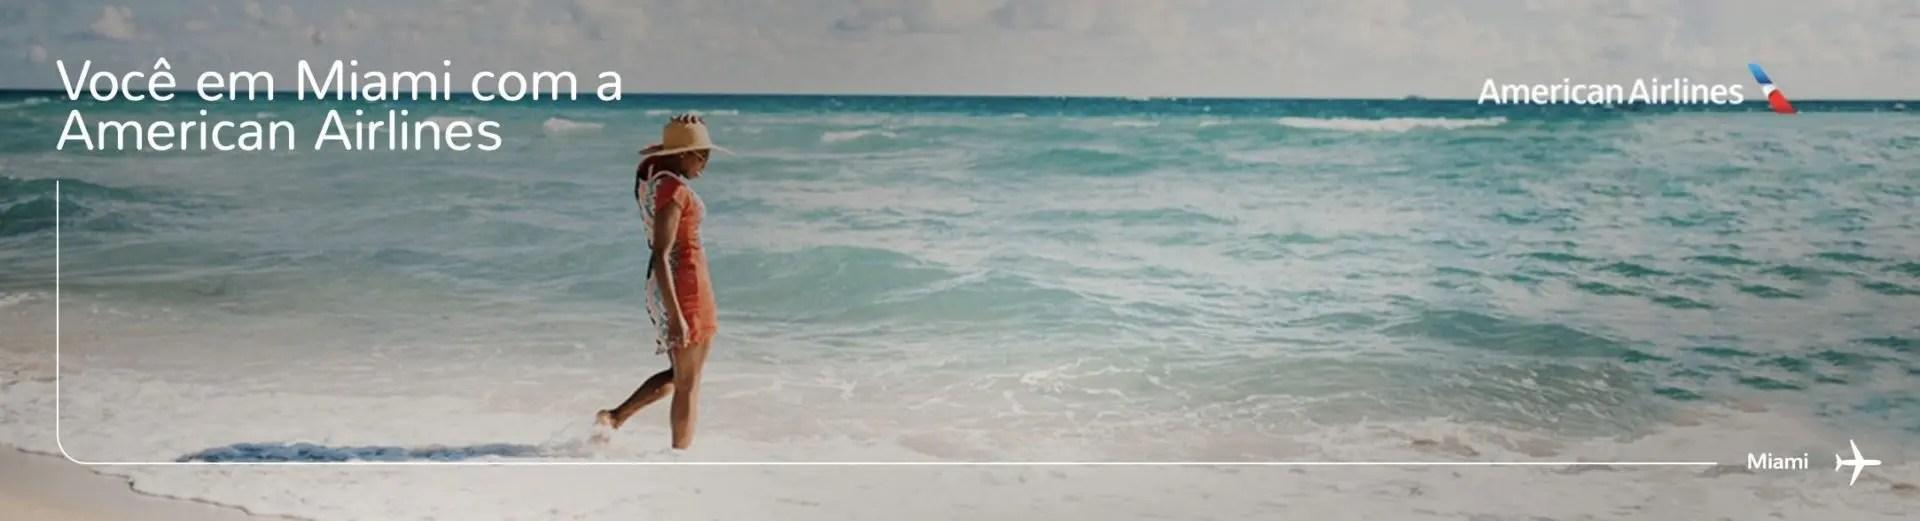 Smiles American Airlines Miami